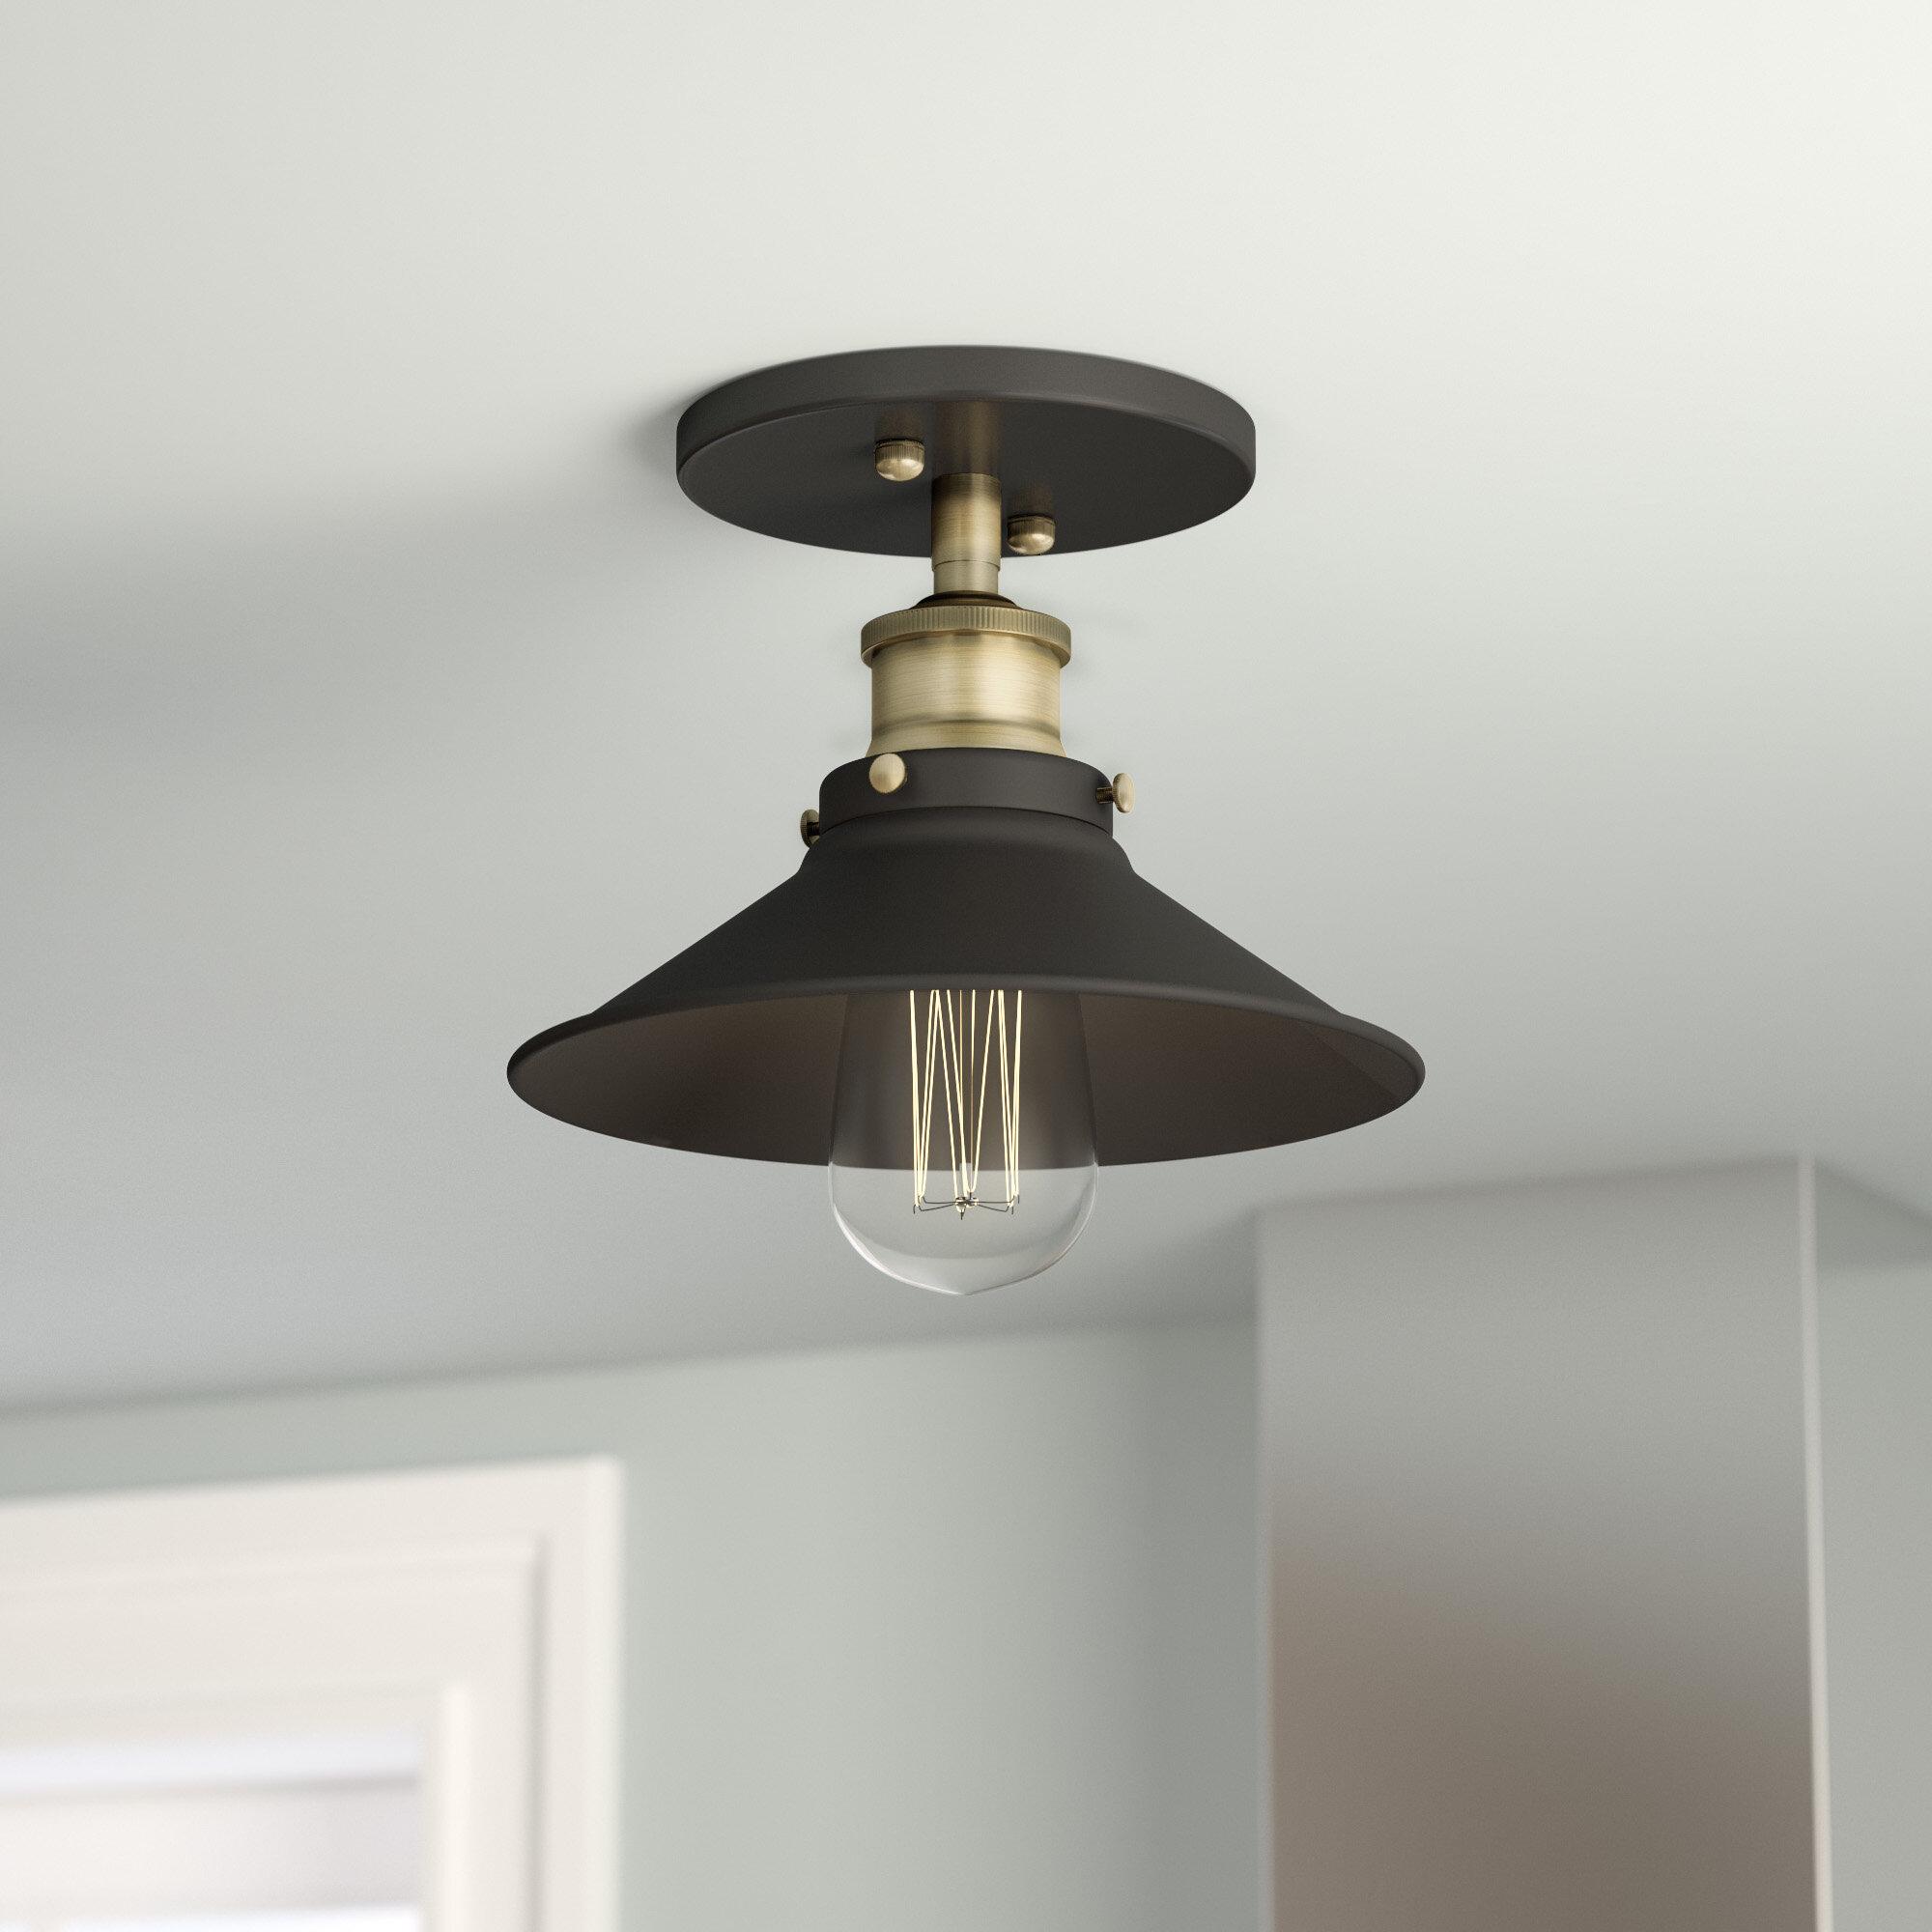 Trent austin design montreal 1 light semi flush mount reviews wayfair